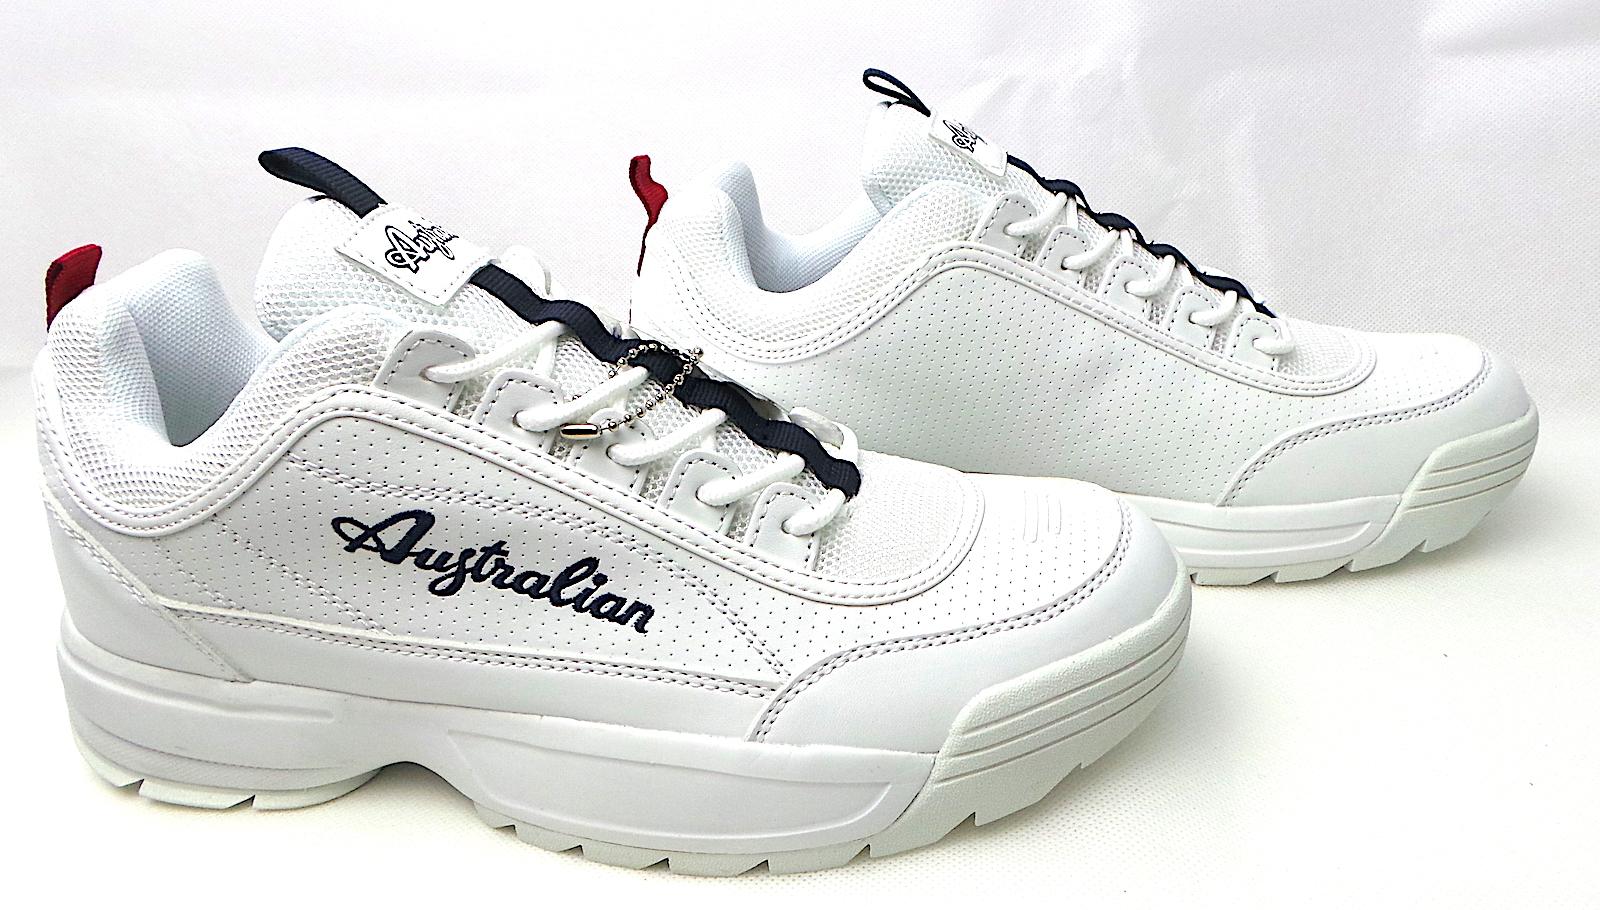 categoria 3 delpopoloshop scarpe AUSTRALIAN,Scarpe